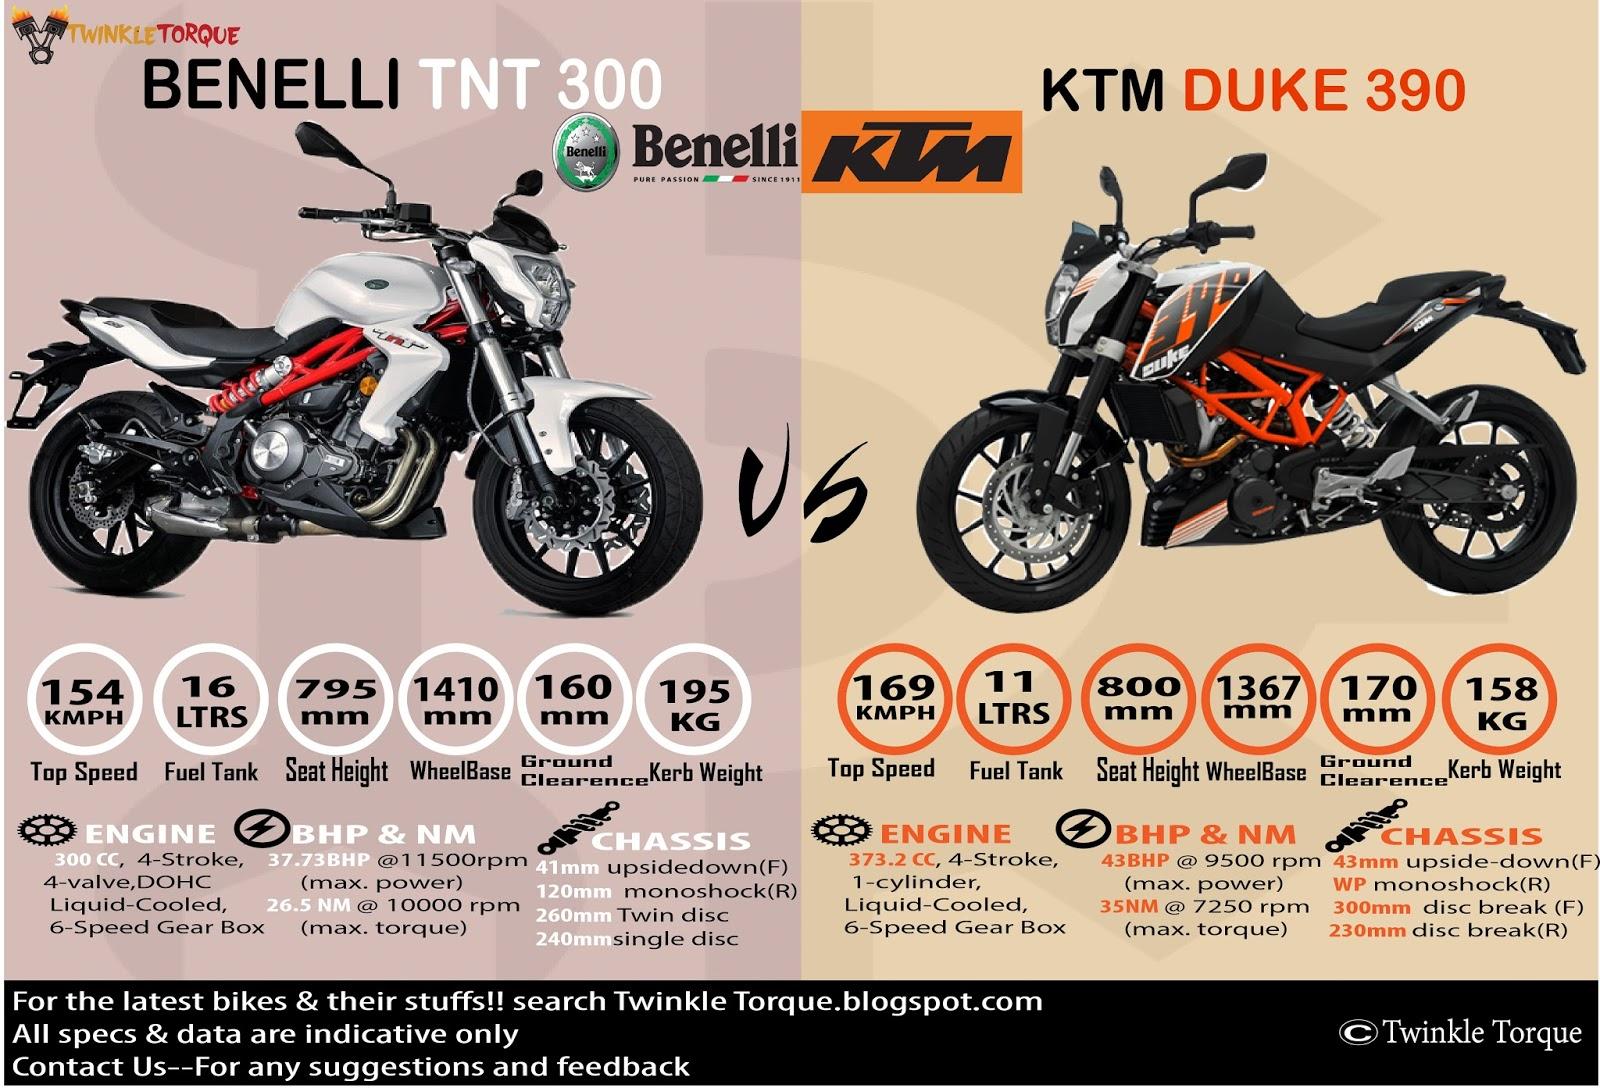 BENELLI TNT 300 v/s KTM DUKE 390 twinkle torque